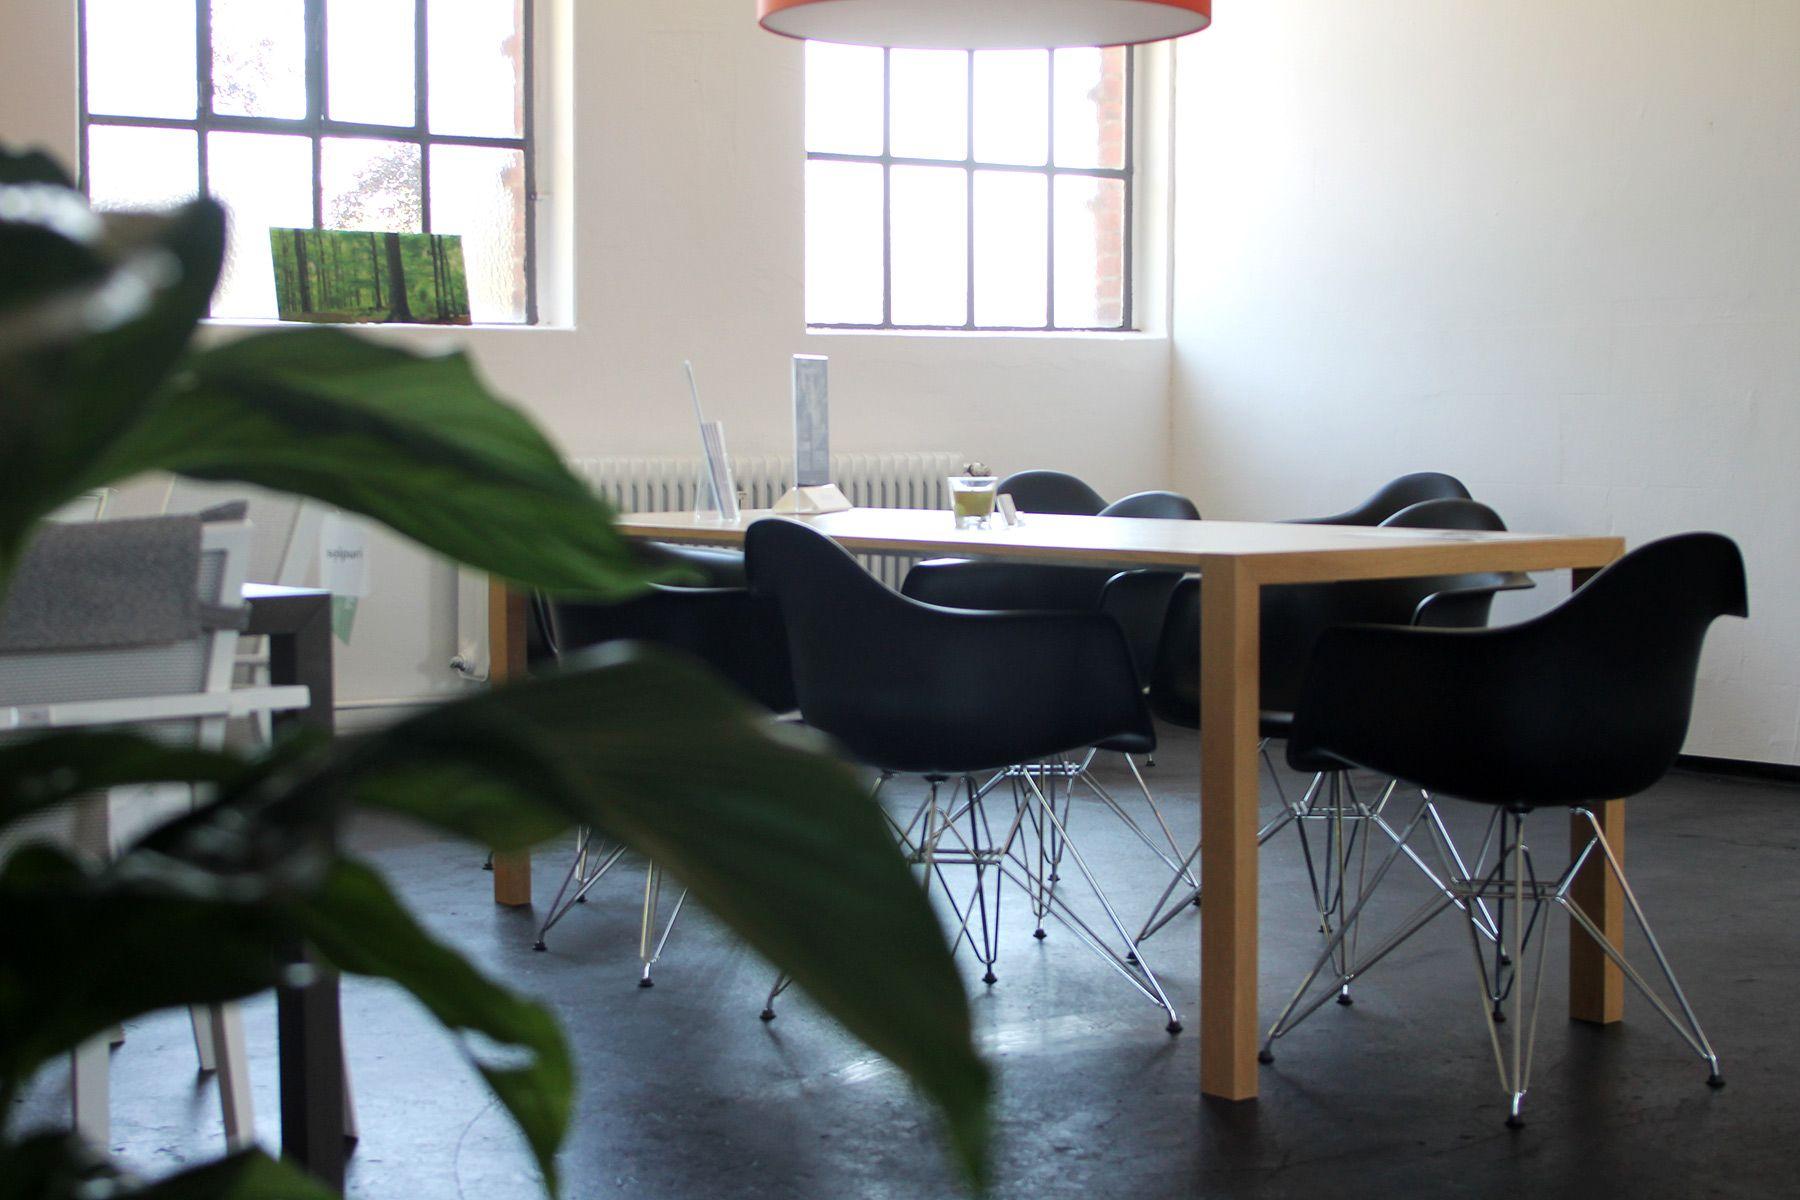 Möbelladen Bielefeld individuelle möbel in unserem concept store in bielefeld milse